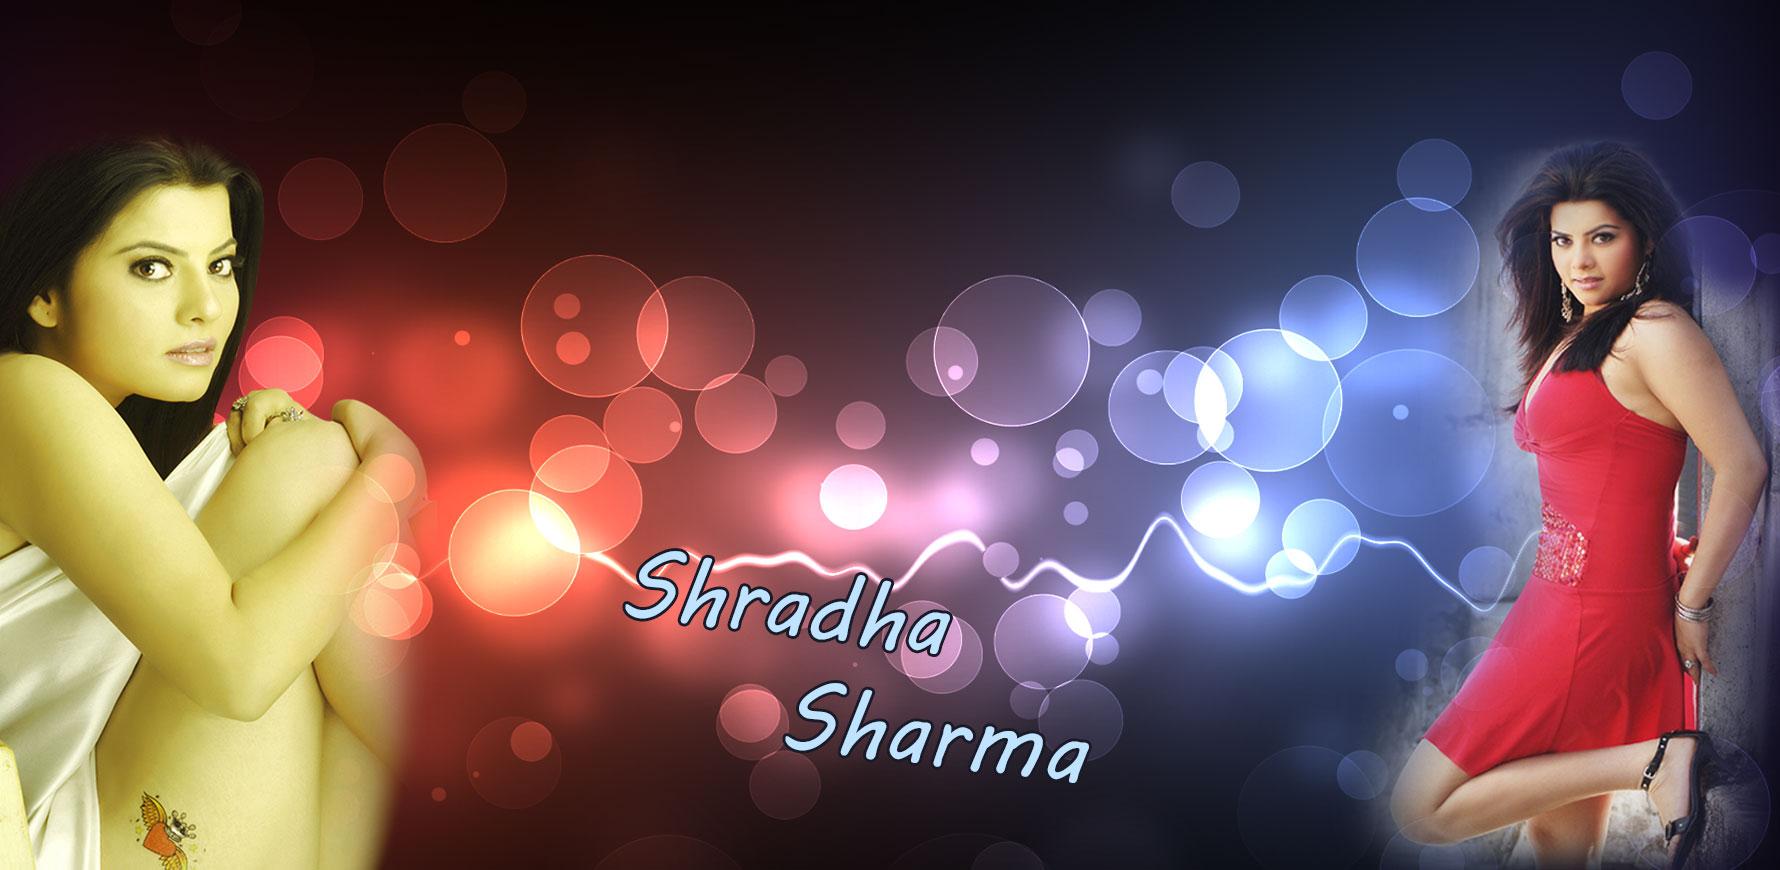 http://www.shradhasharma.com/wp-content/uploads/2017/07/banner-new-3.jpg